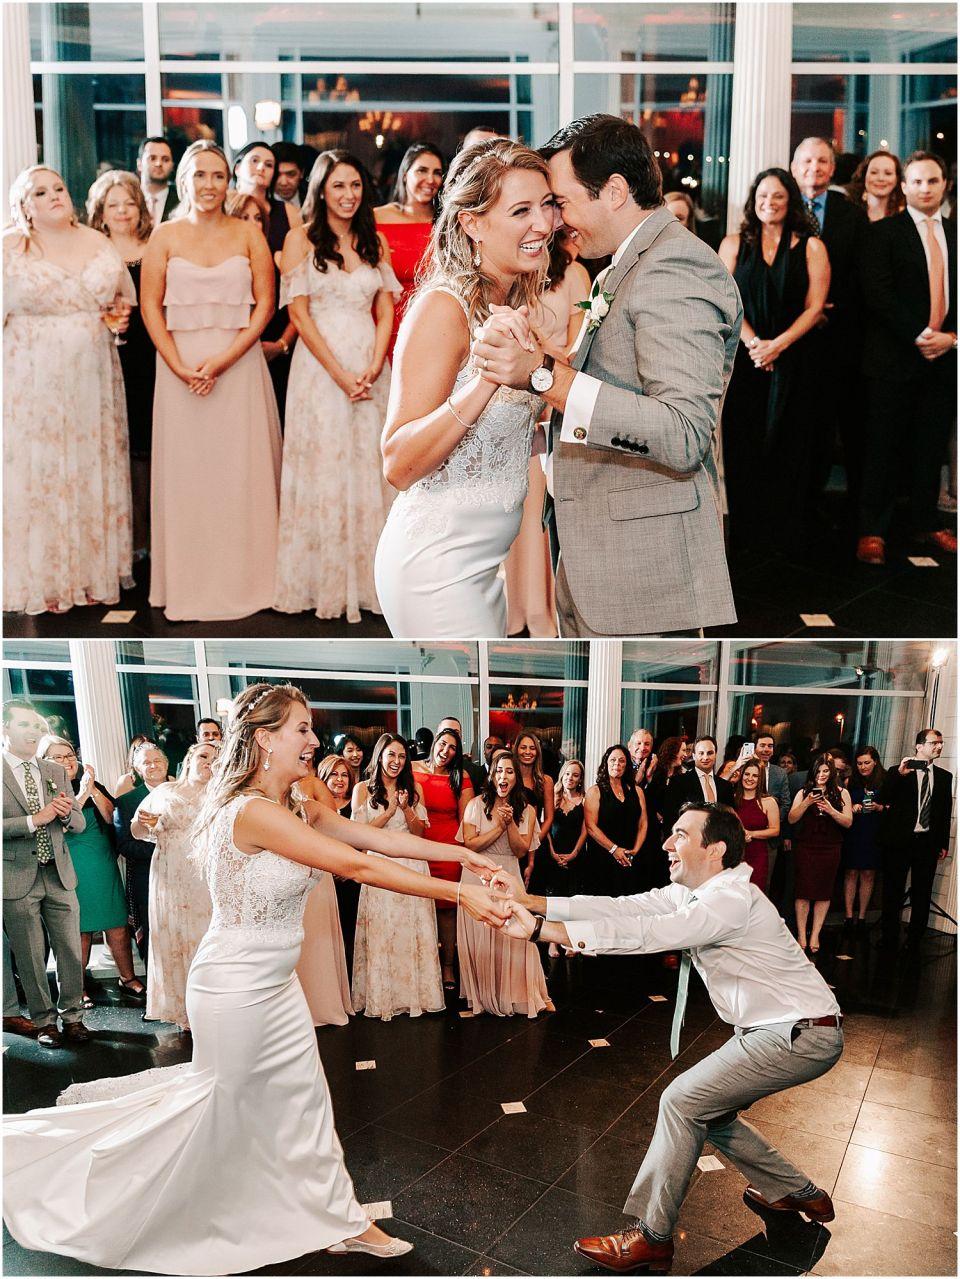 Capturing the bride and groom dance at this Mallard Island Yacht Club Wedding